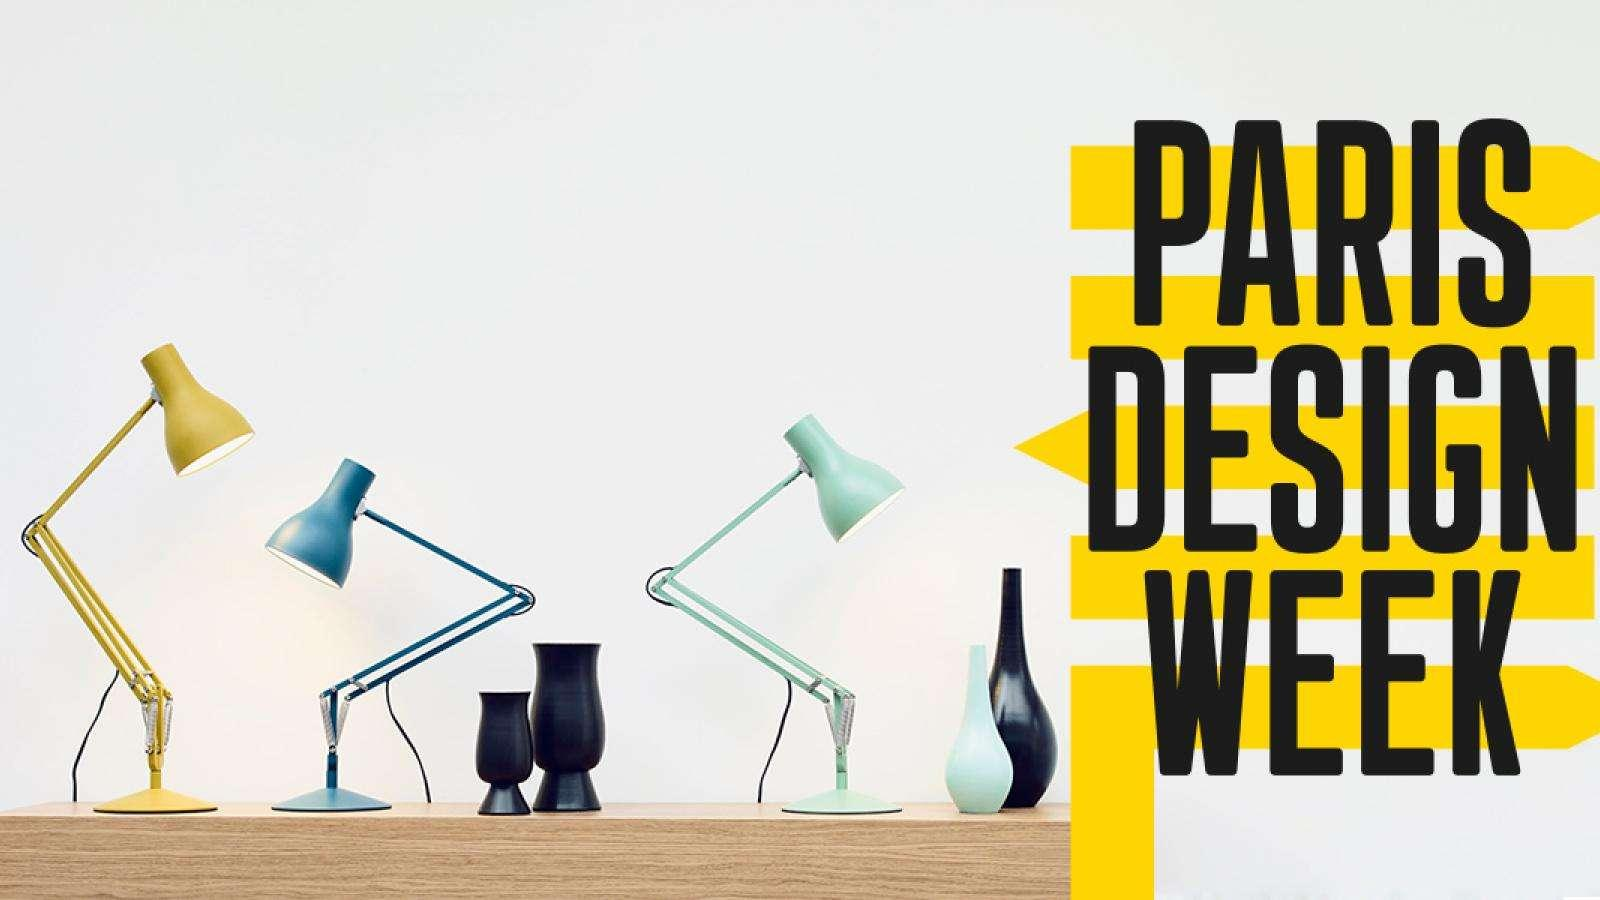 Paris Design Week - a city-wide event